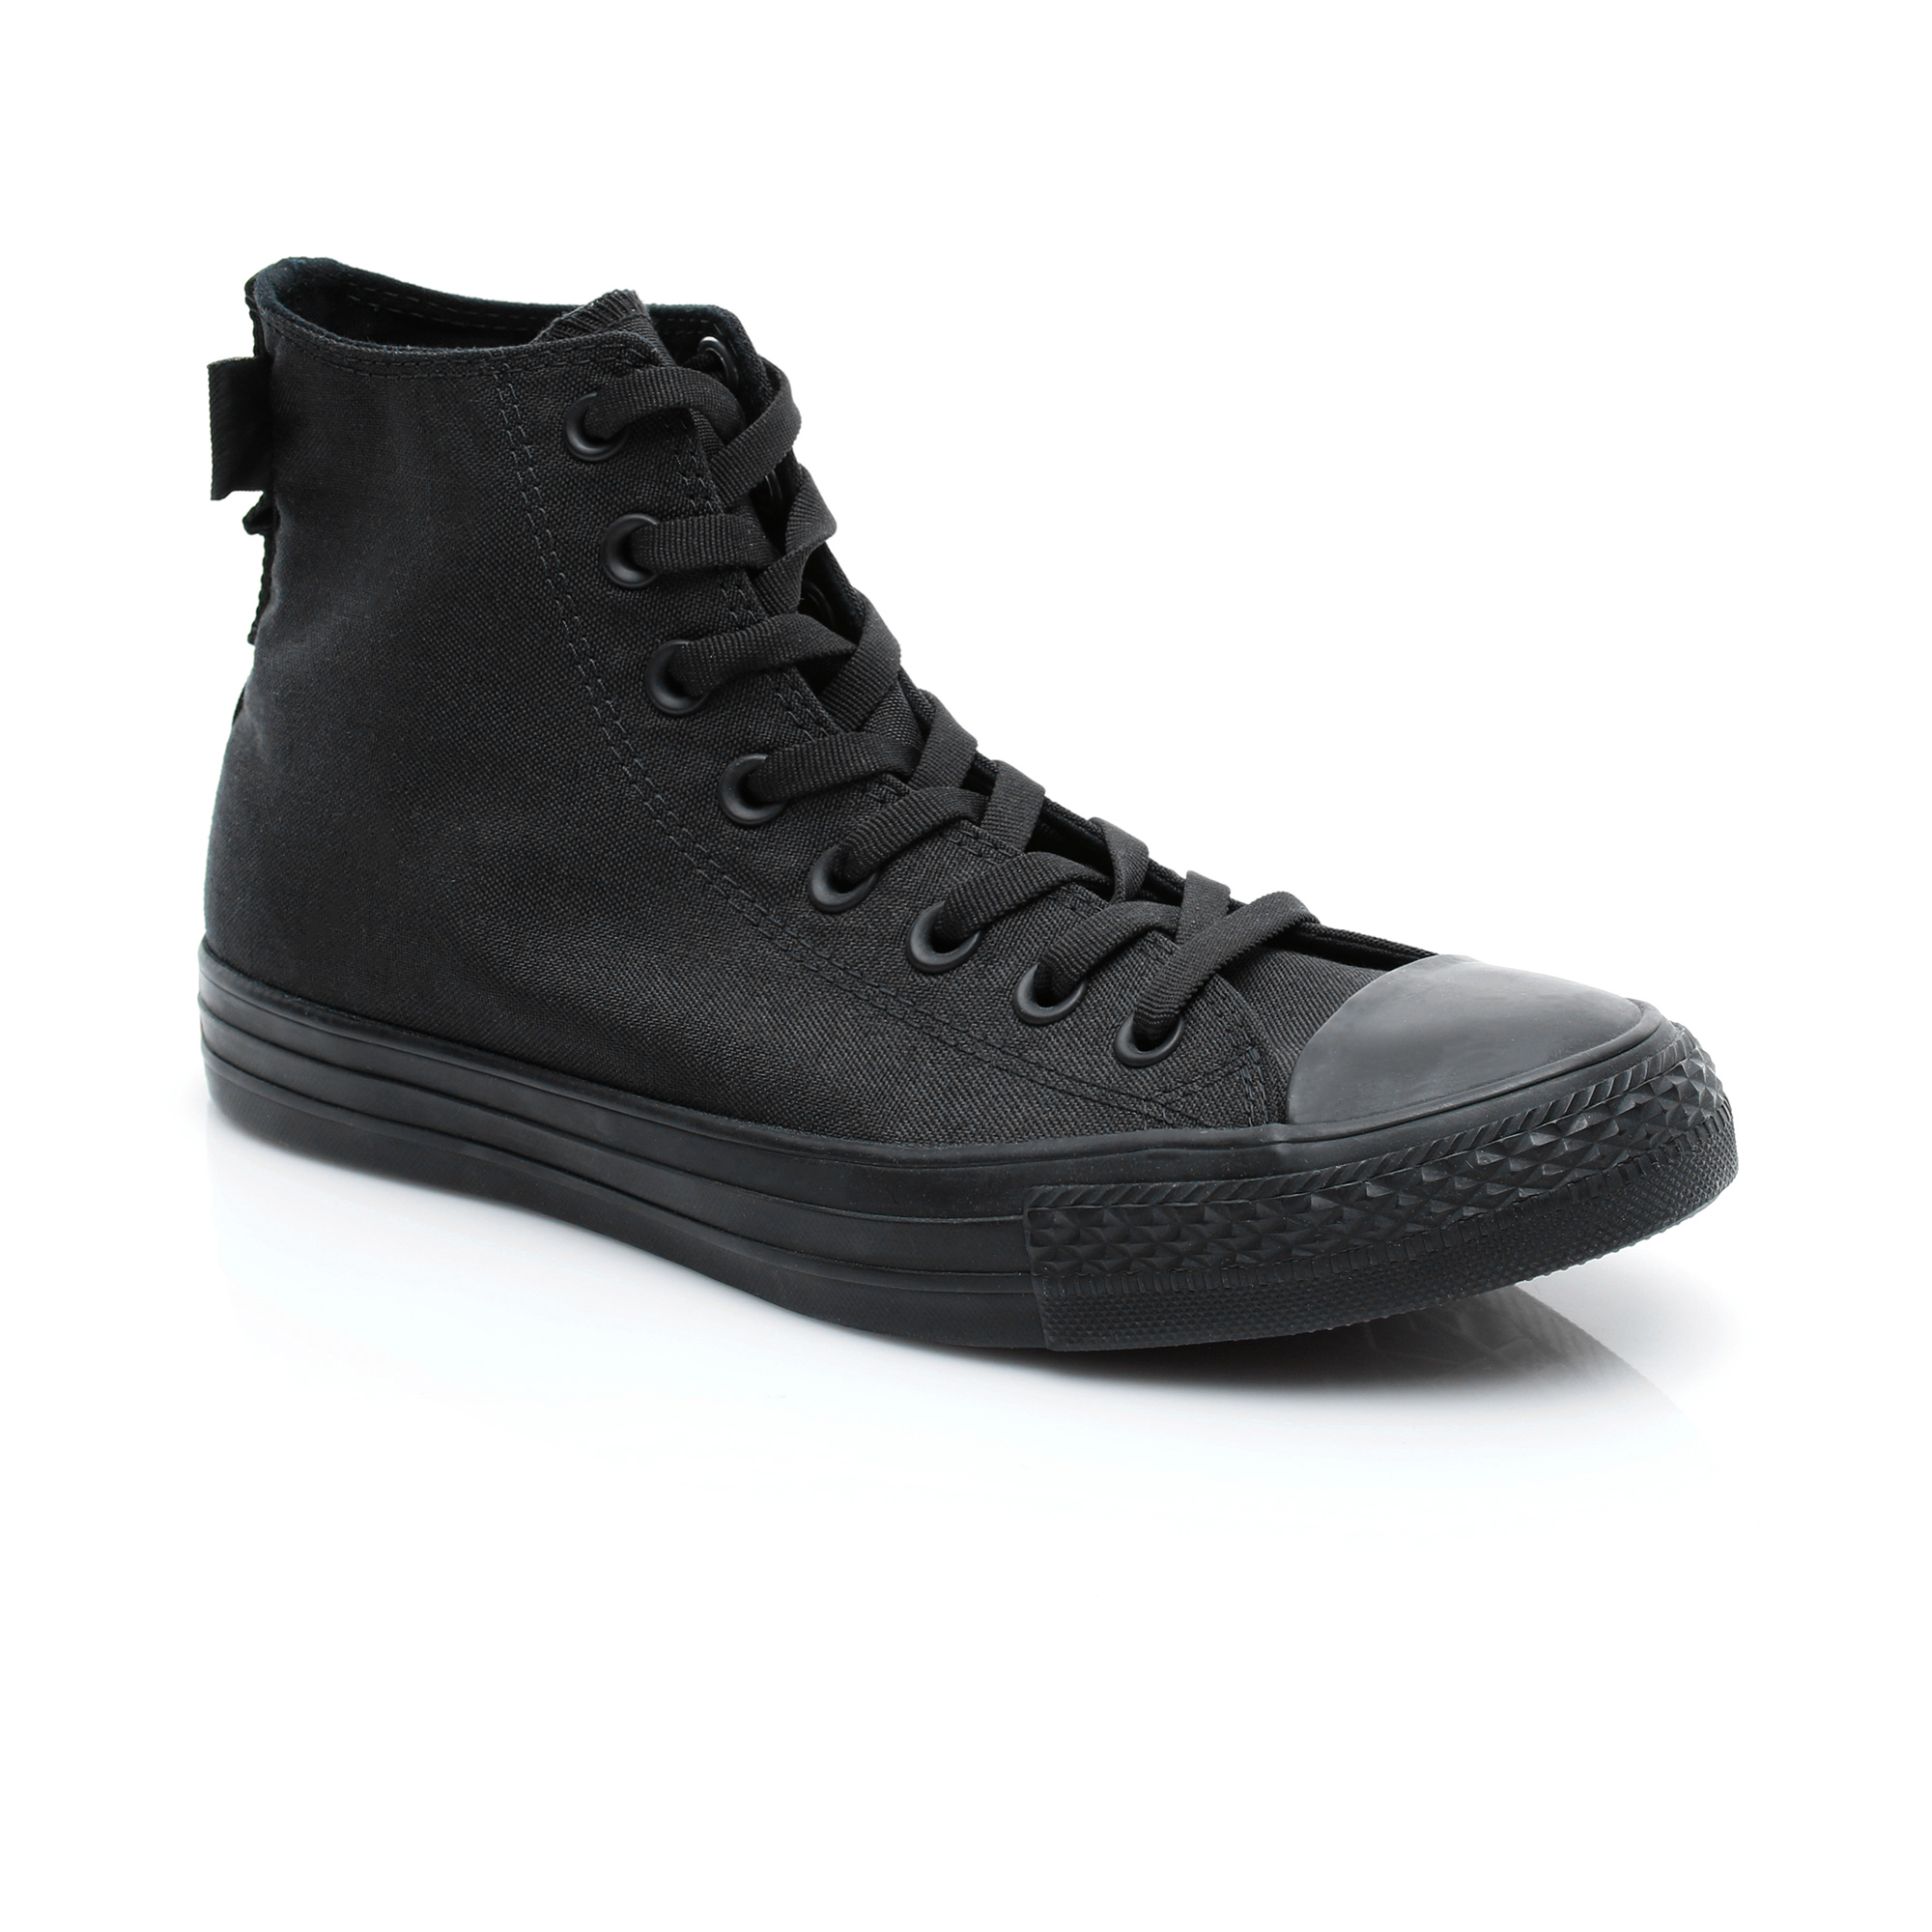 Converse Chuck Taylor All Star Mid Erkek Siyah Sneaker